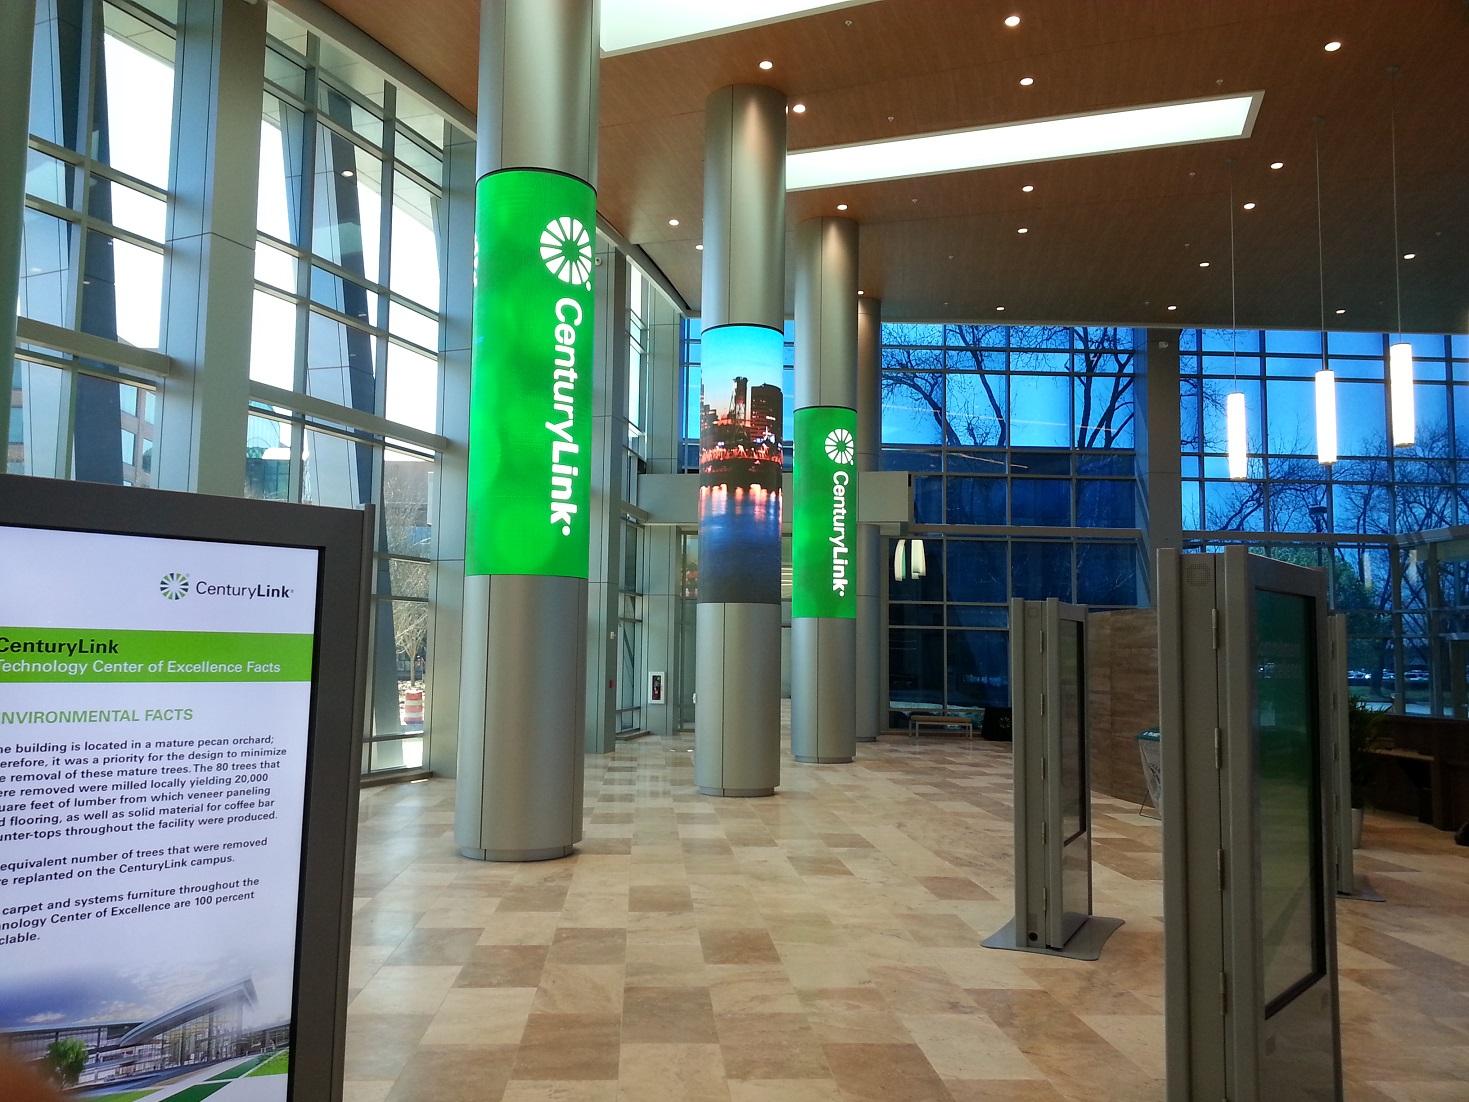 Lobby with pillars that have CenturyLink logo on them.